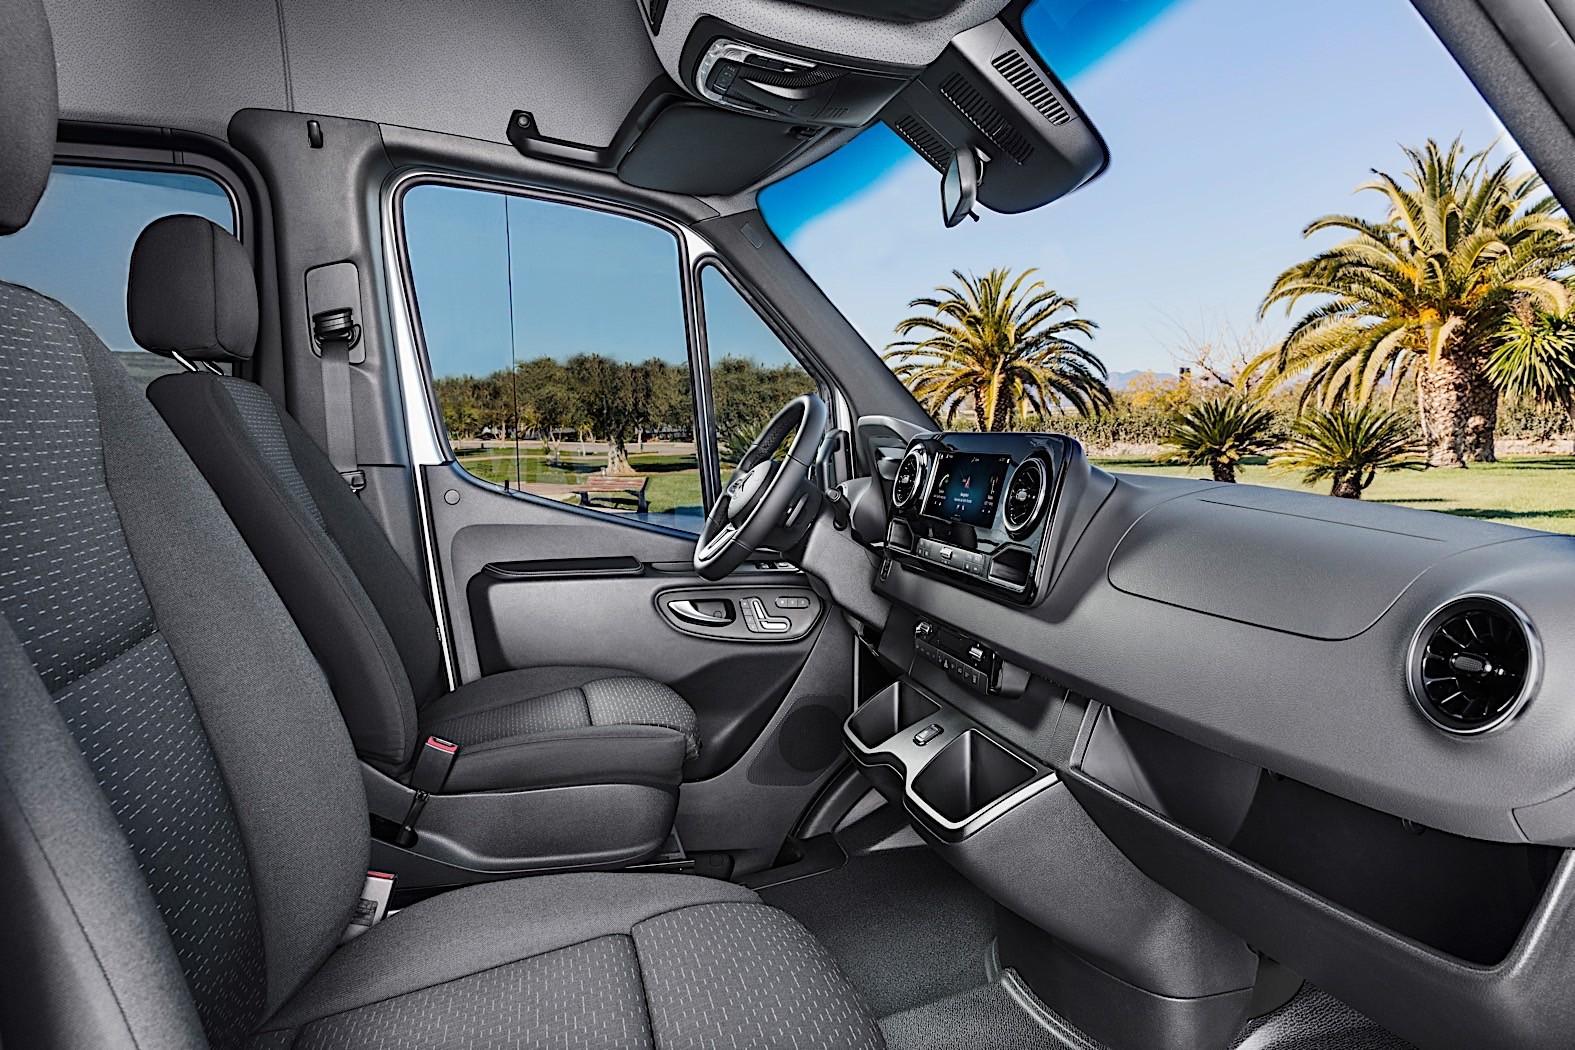 Mercedes Benz Sprinter Based Rv Reviewed By Autoblog